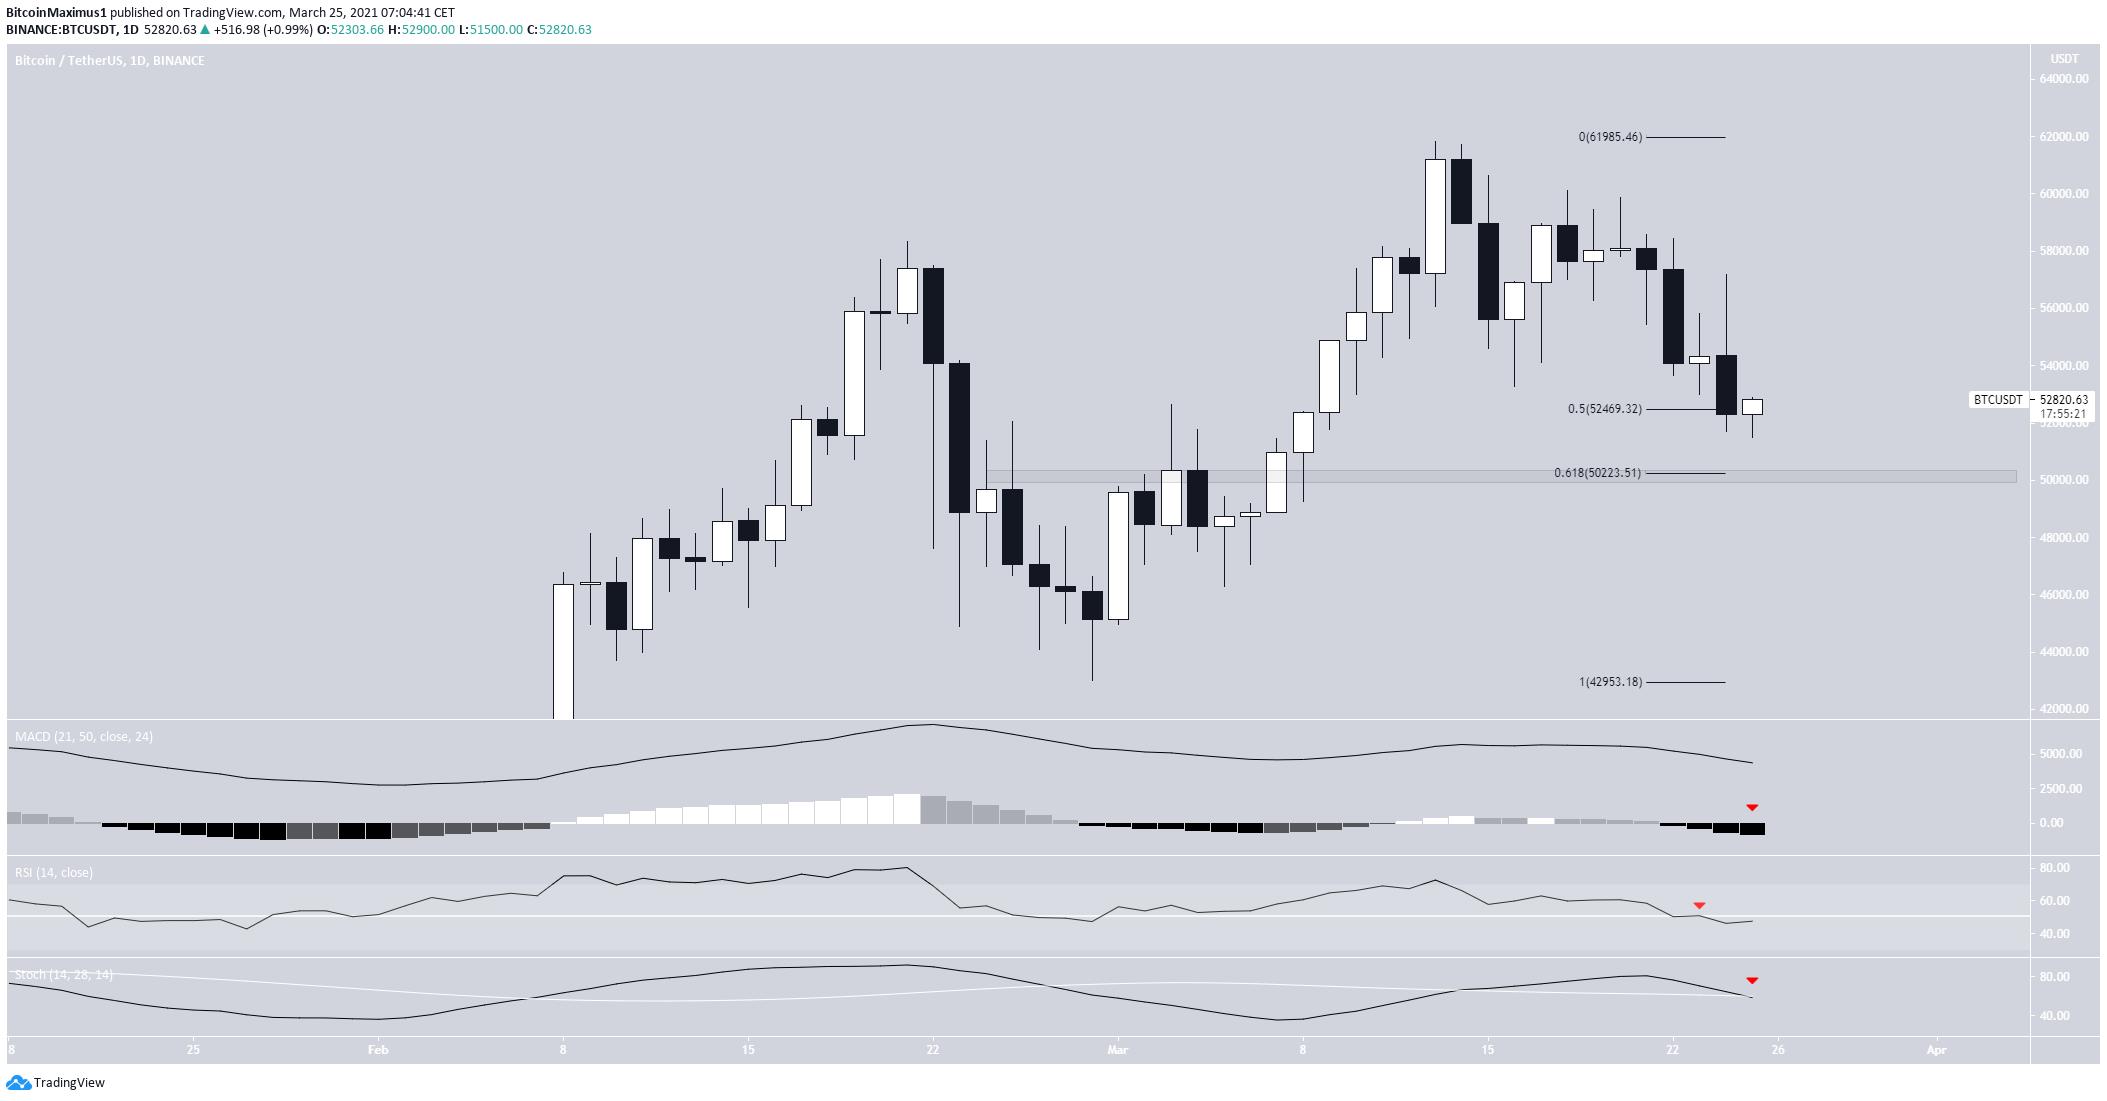 Bitcoin Daily Movement